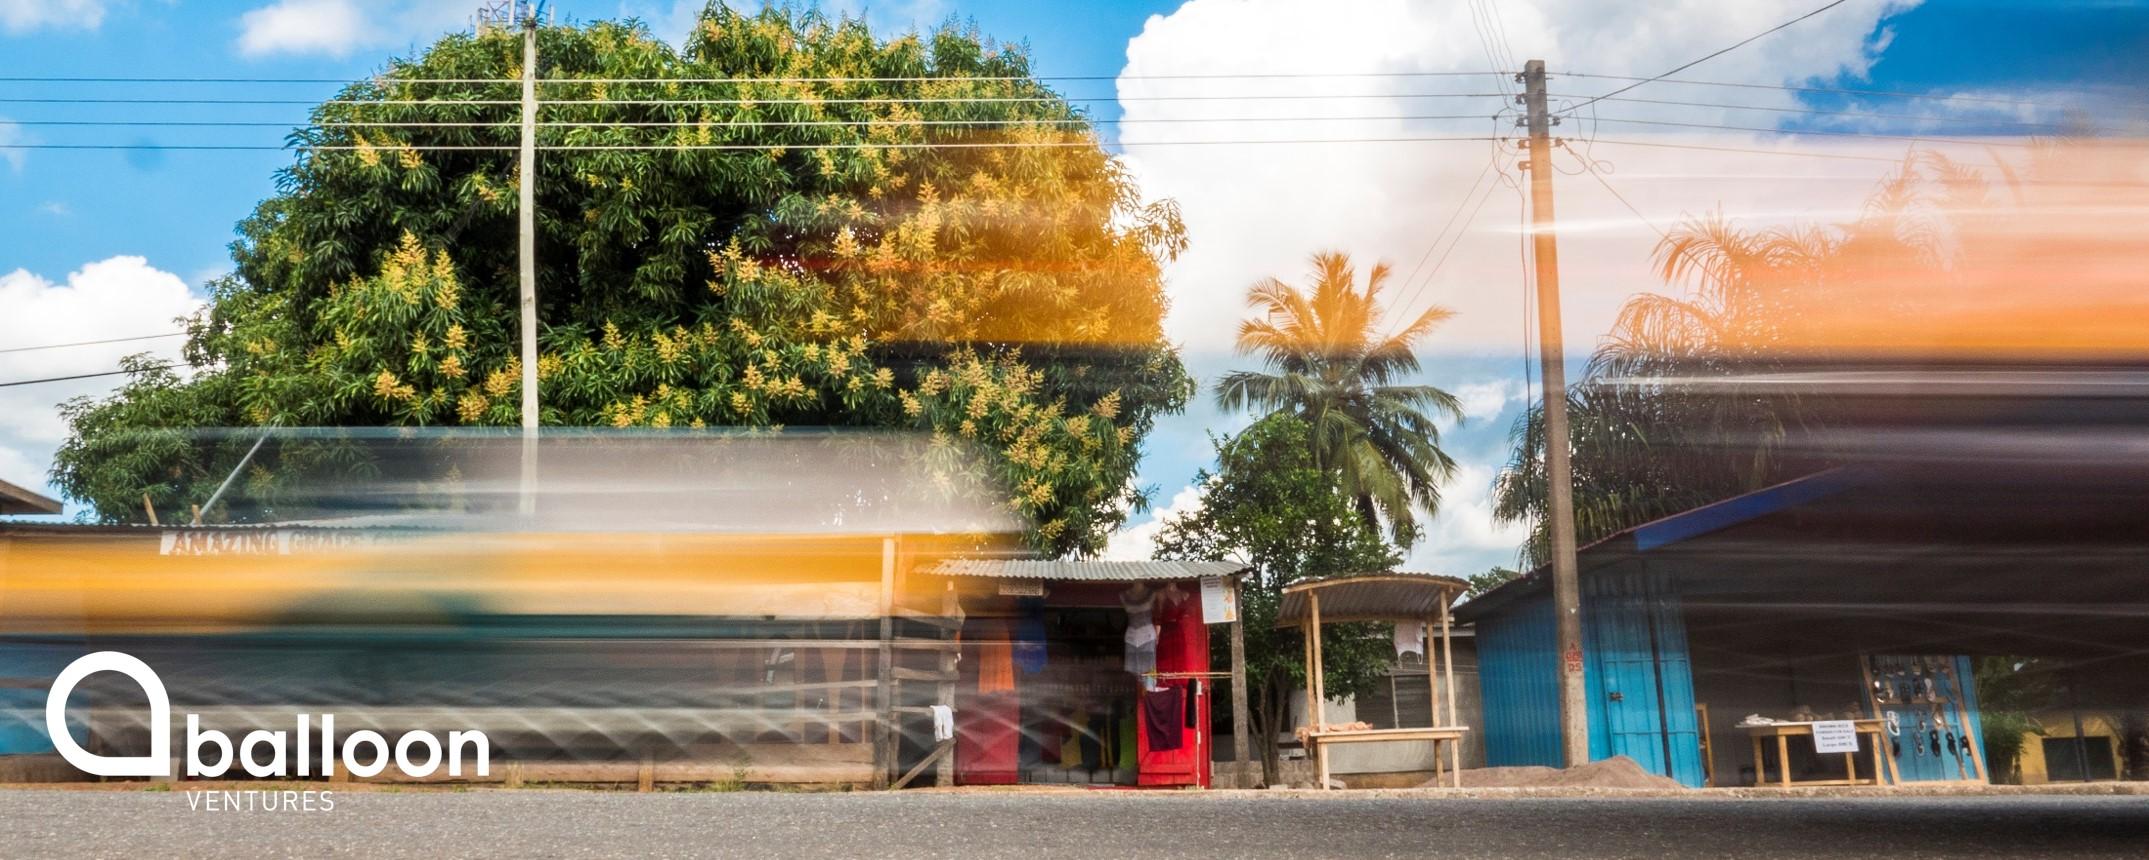 Balloon Ventures - Entrepreneurial Opportunity Movemeback African opportunity cover image